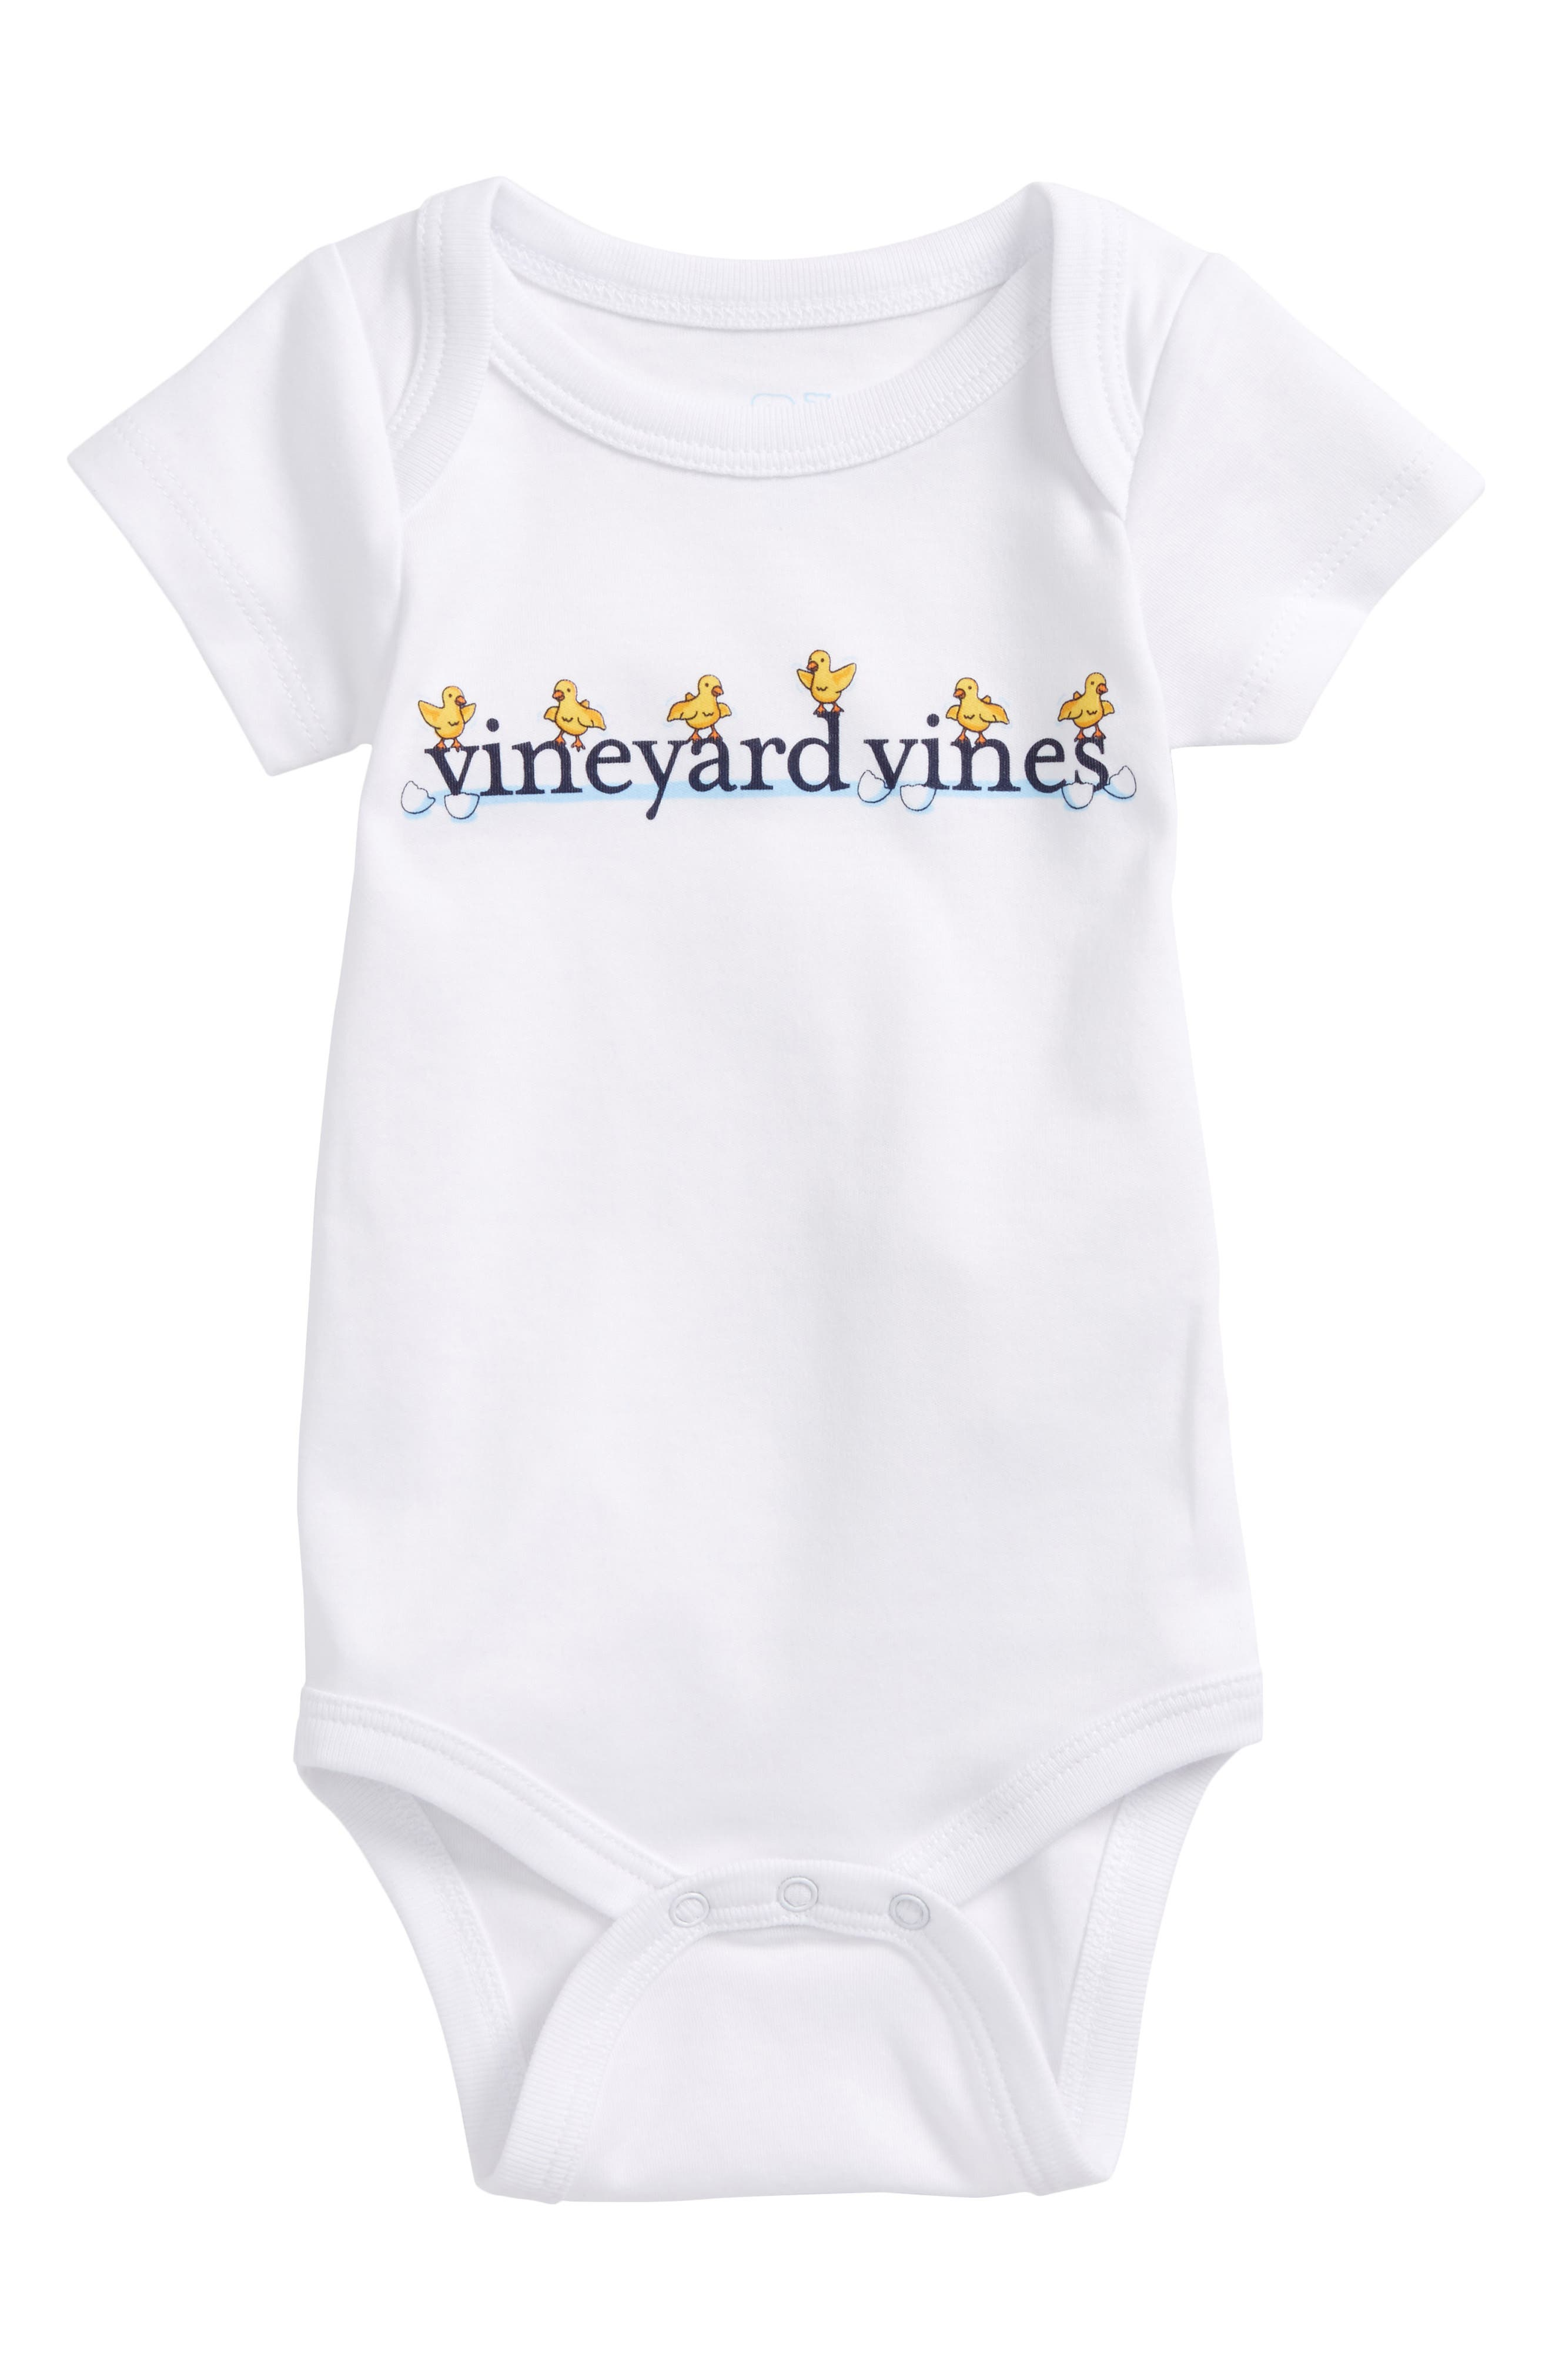 Alternate Image 1 Selected - vineyard vines Easter Chick Pima Cotton Bodysuit (Baby)